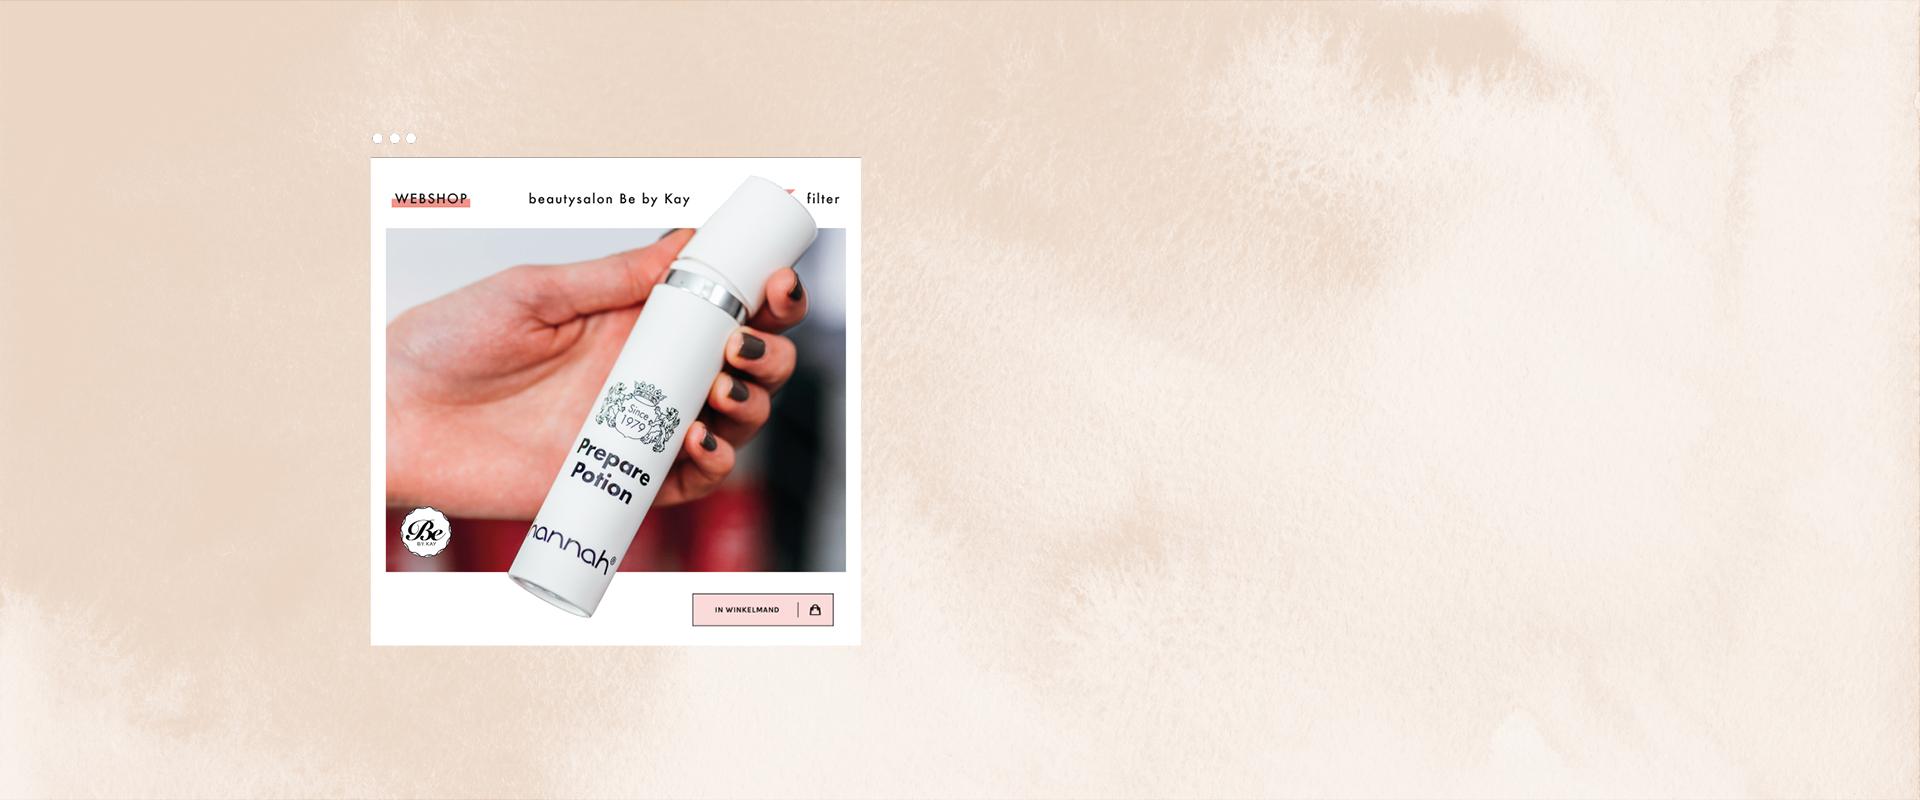 bebykay producten hannah gezicht webshop